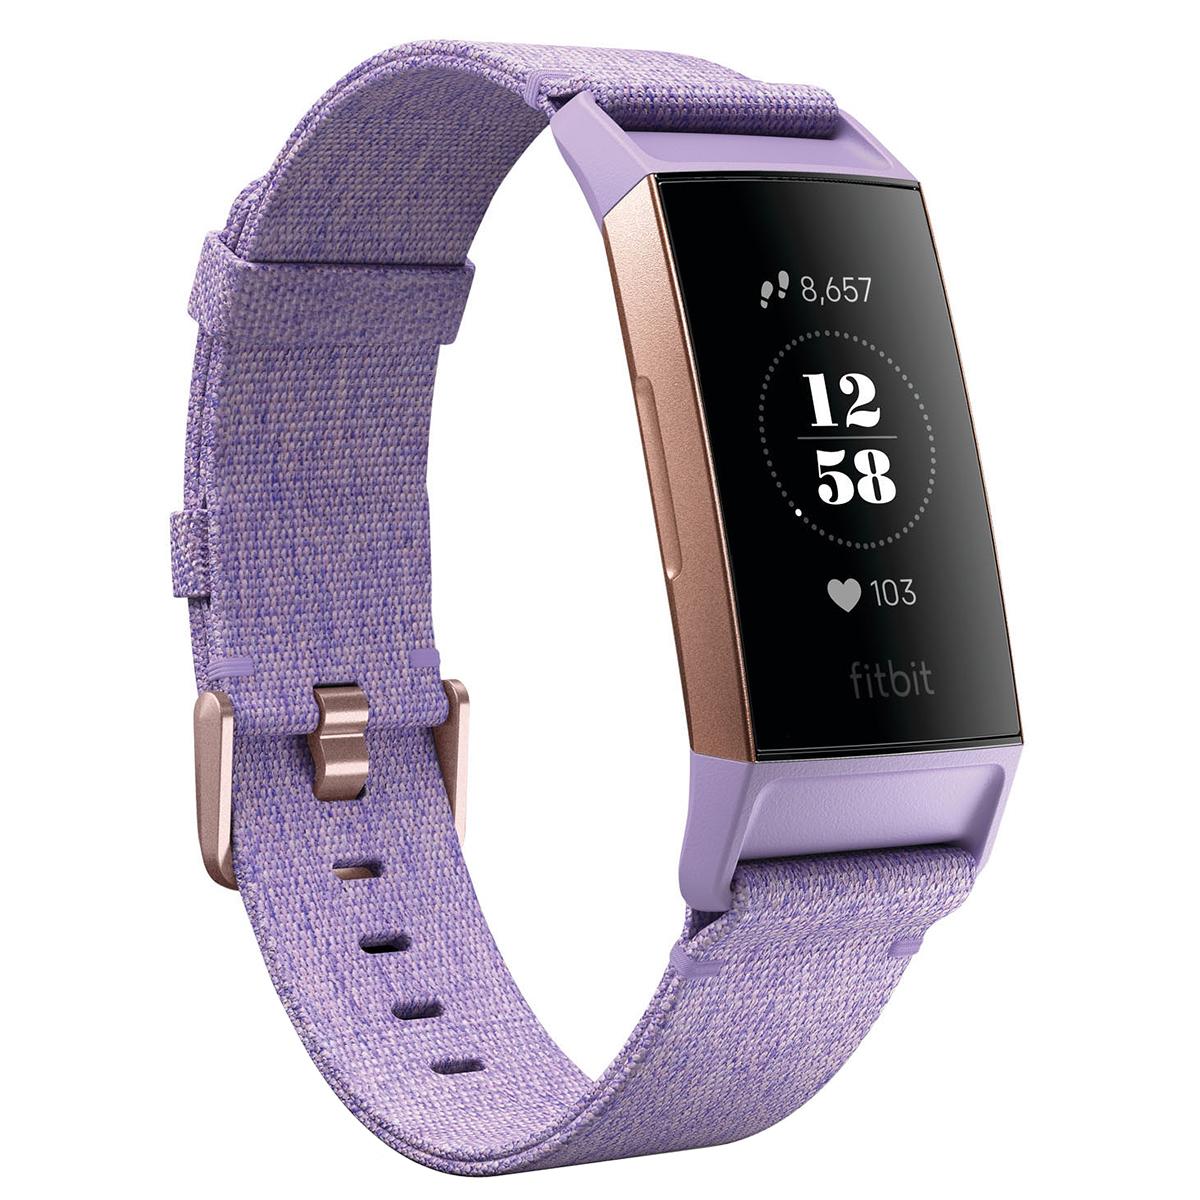 fitbit charge 3 purple wrist watch